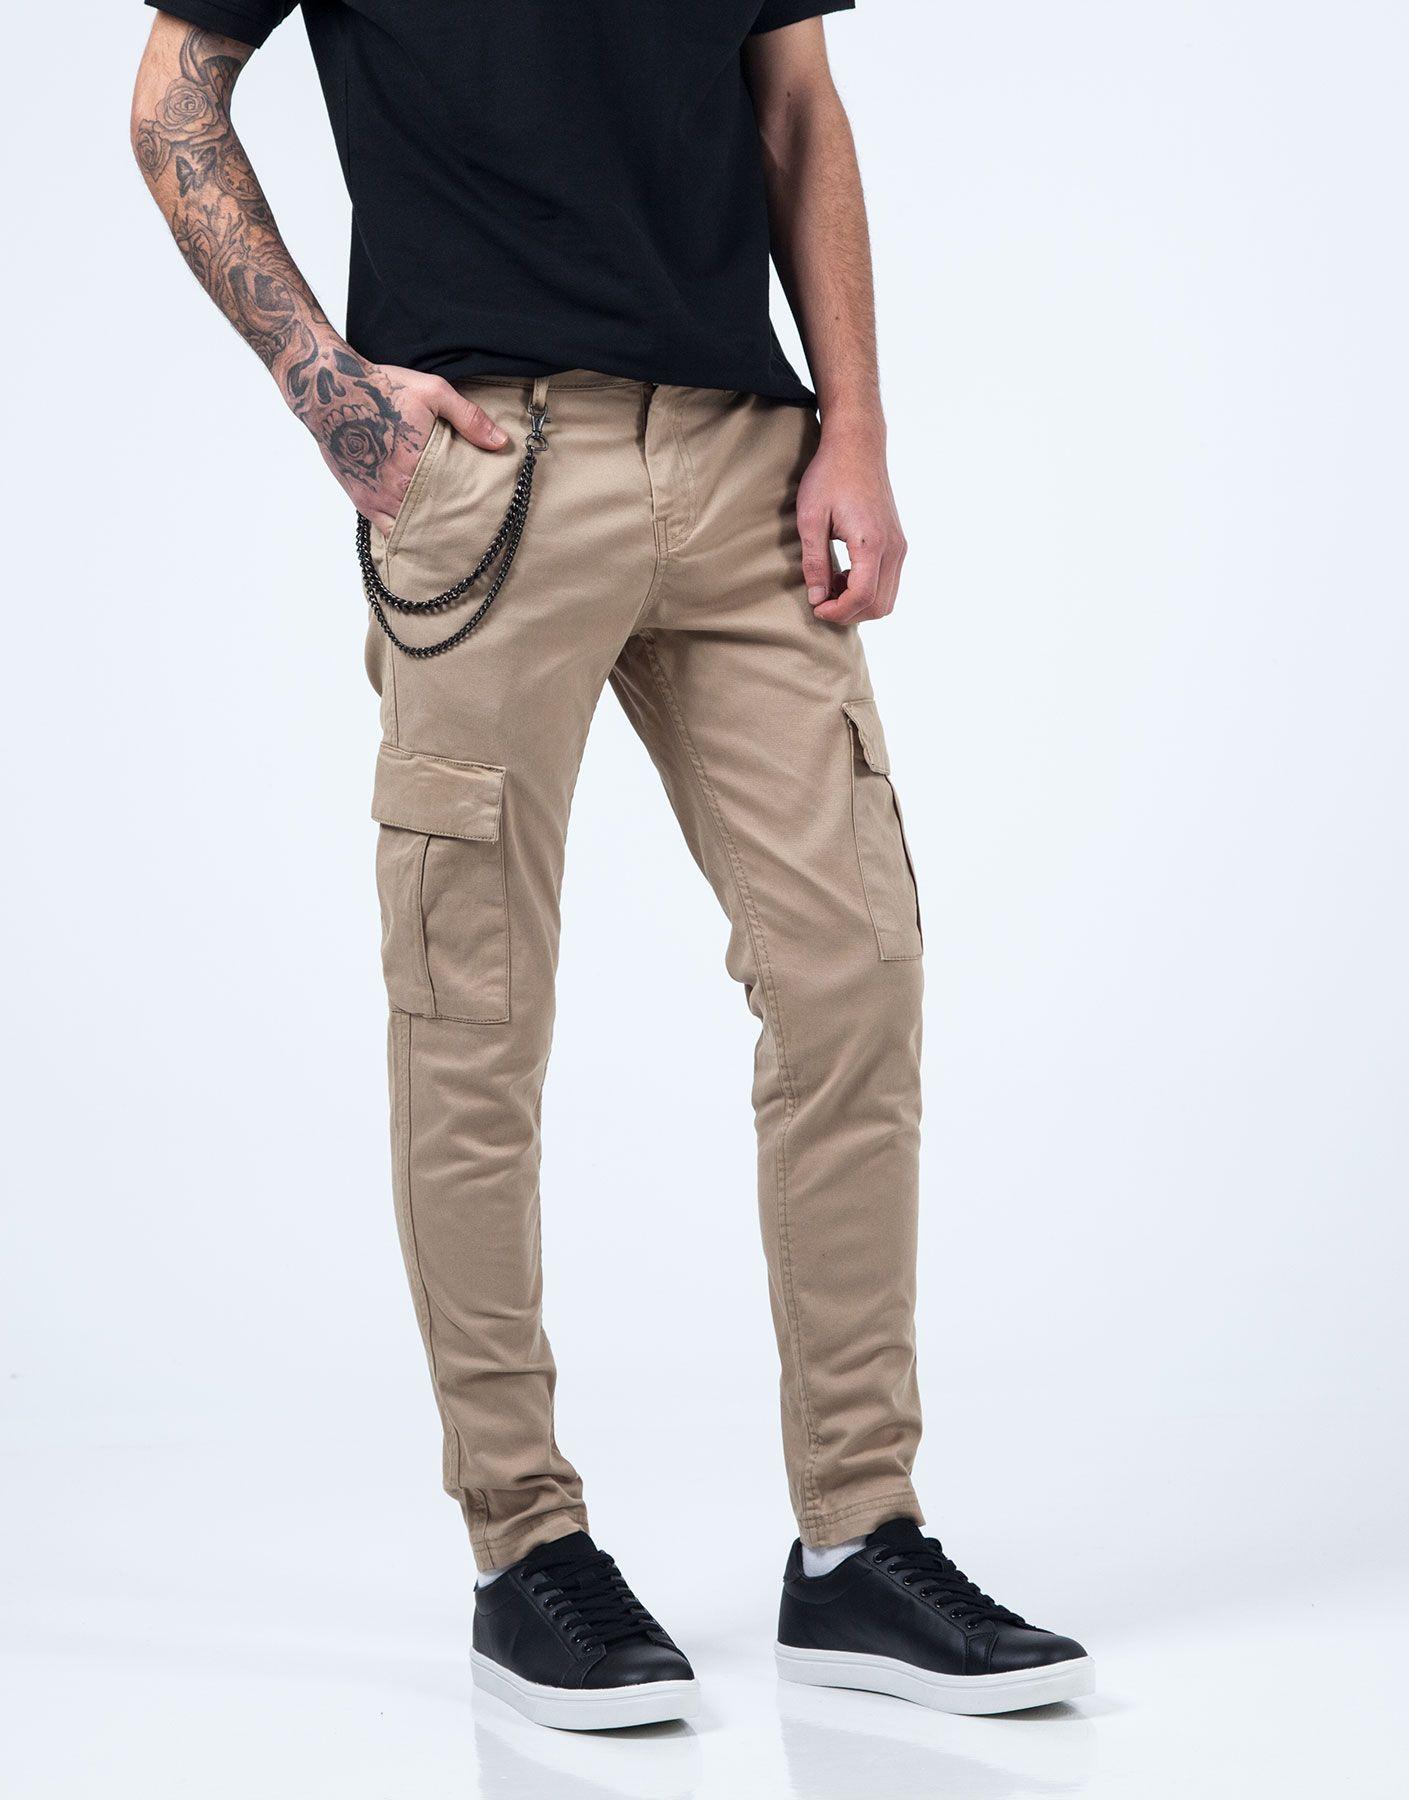 Pantalon Cargo Beige Jvz Pantalones Cargo Pantalones Pantalones Slim Fit